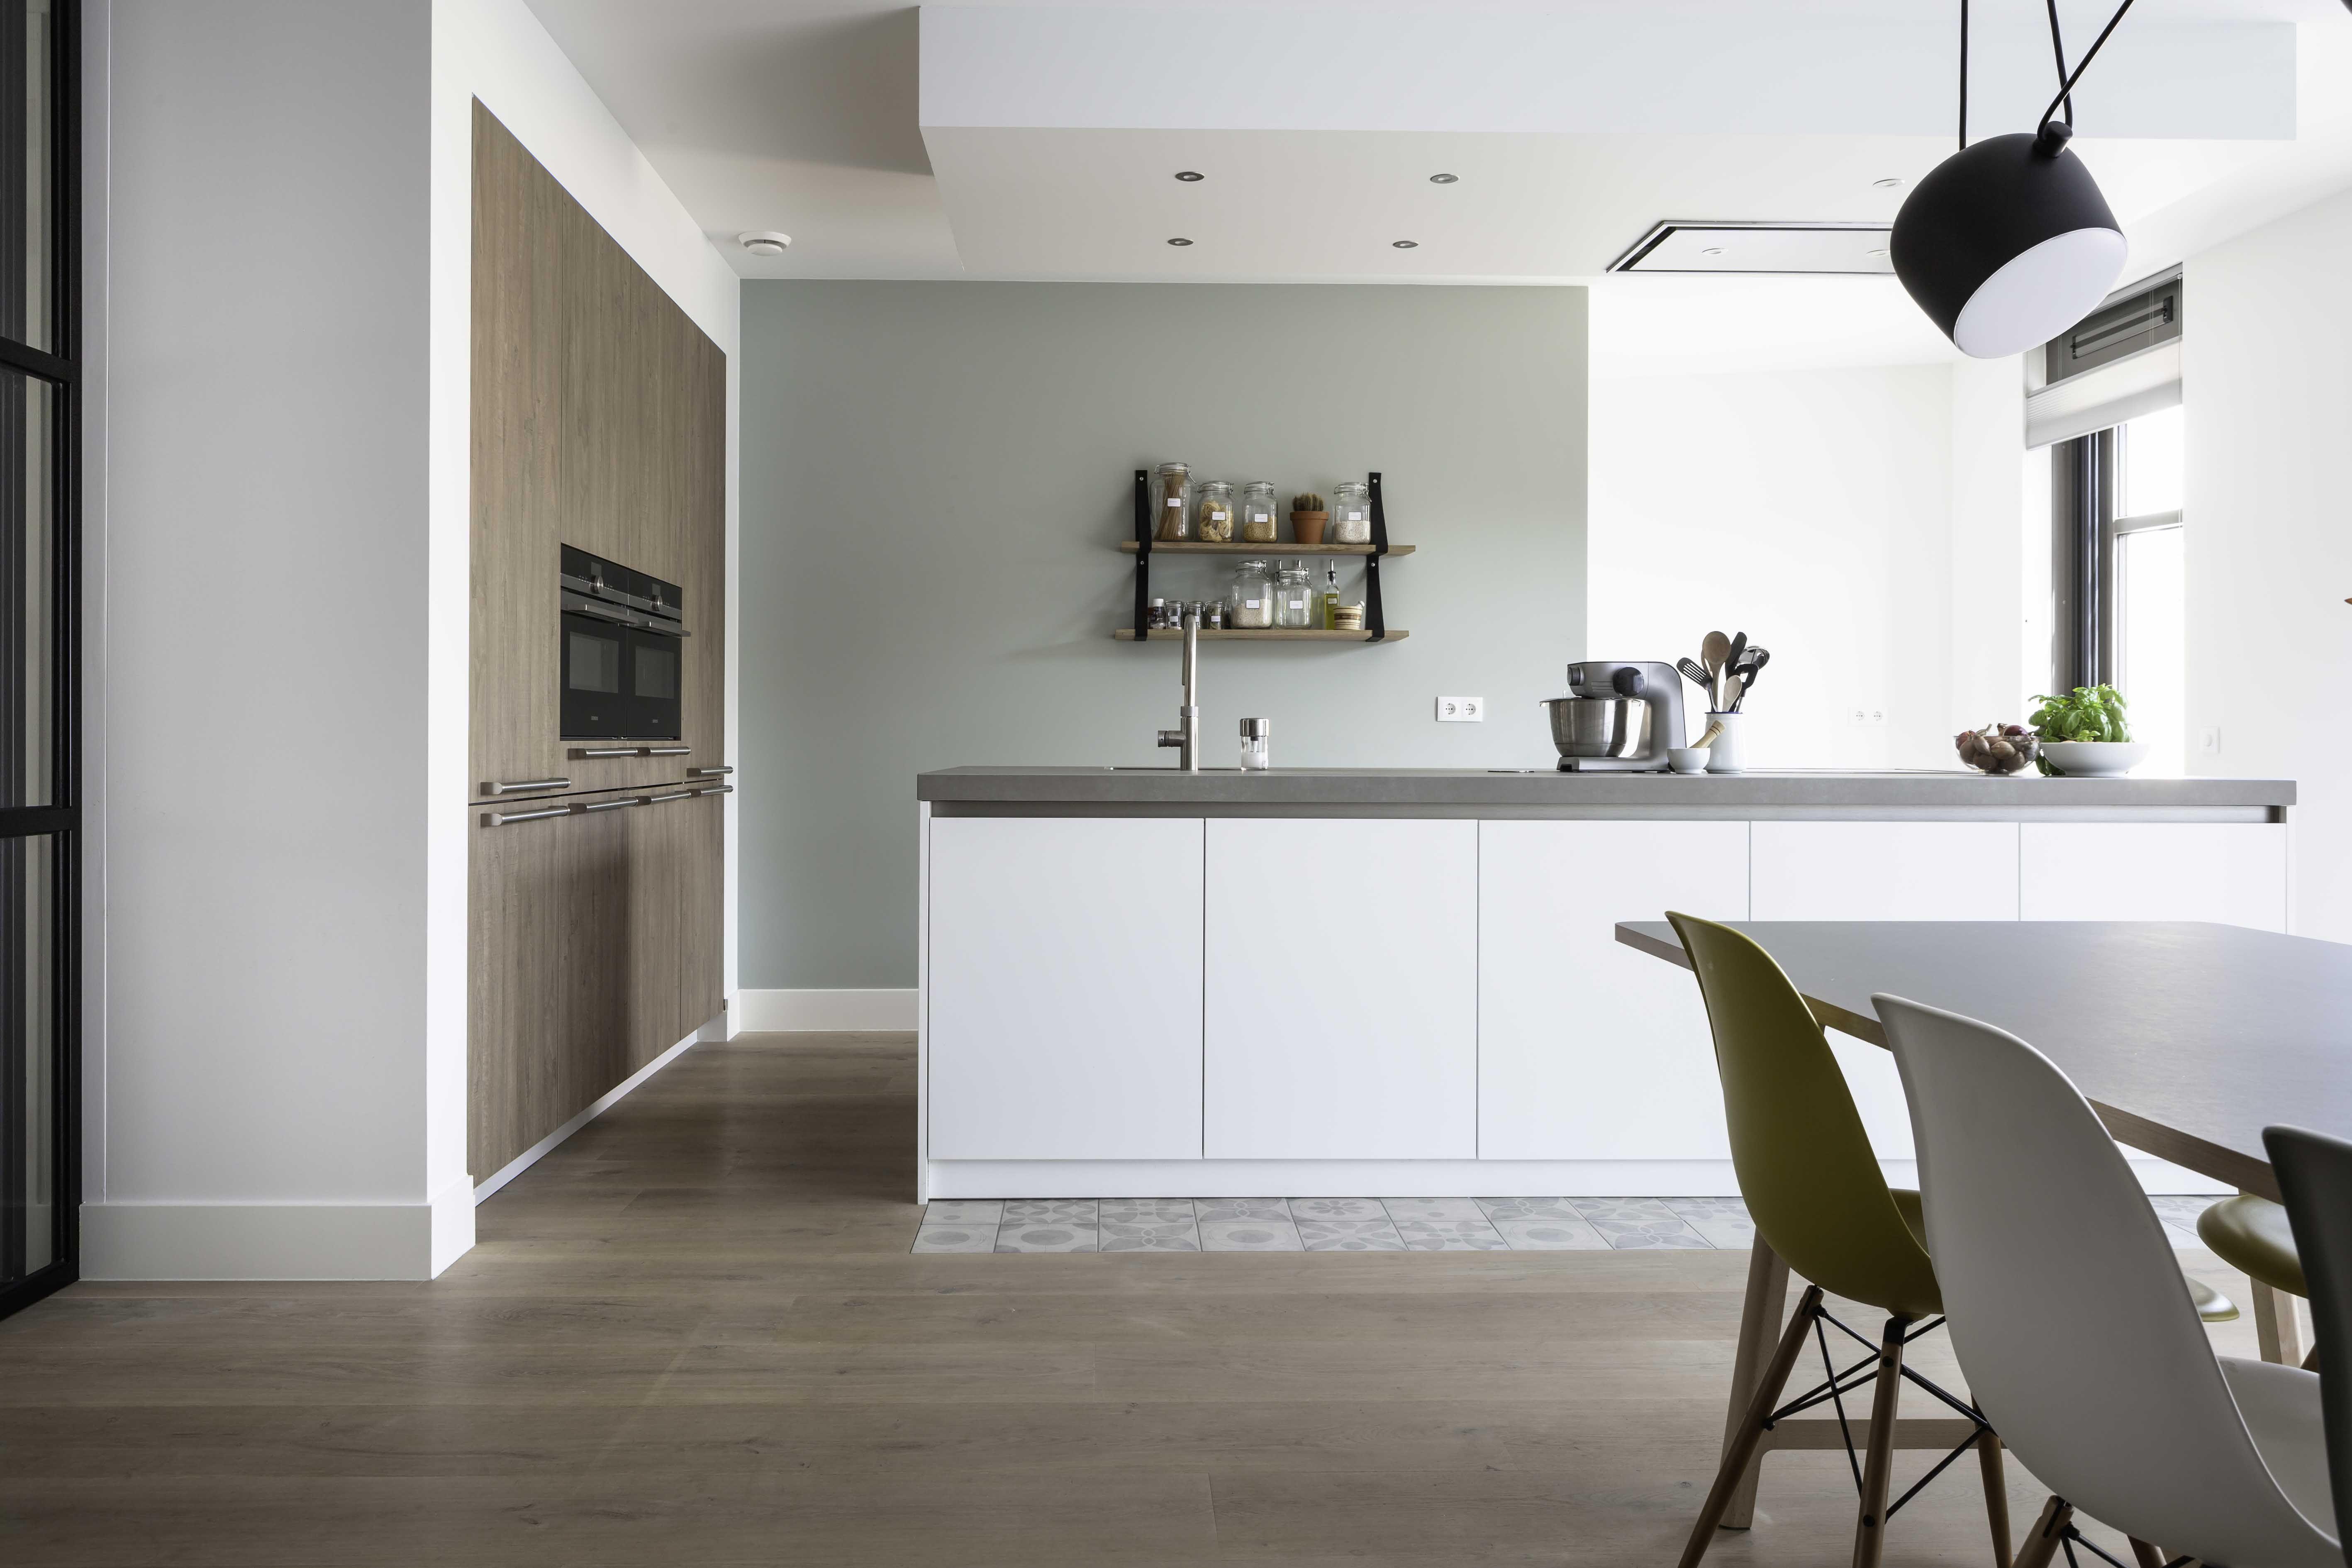 Tegels Keuken Scandinavisch : Keuken scandinavian design scandinavisch interieur studio binnen